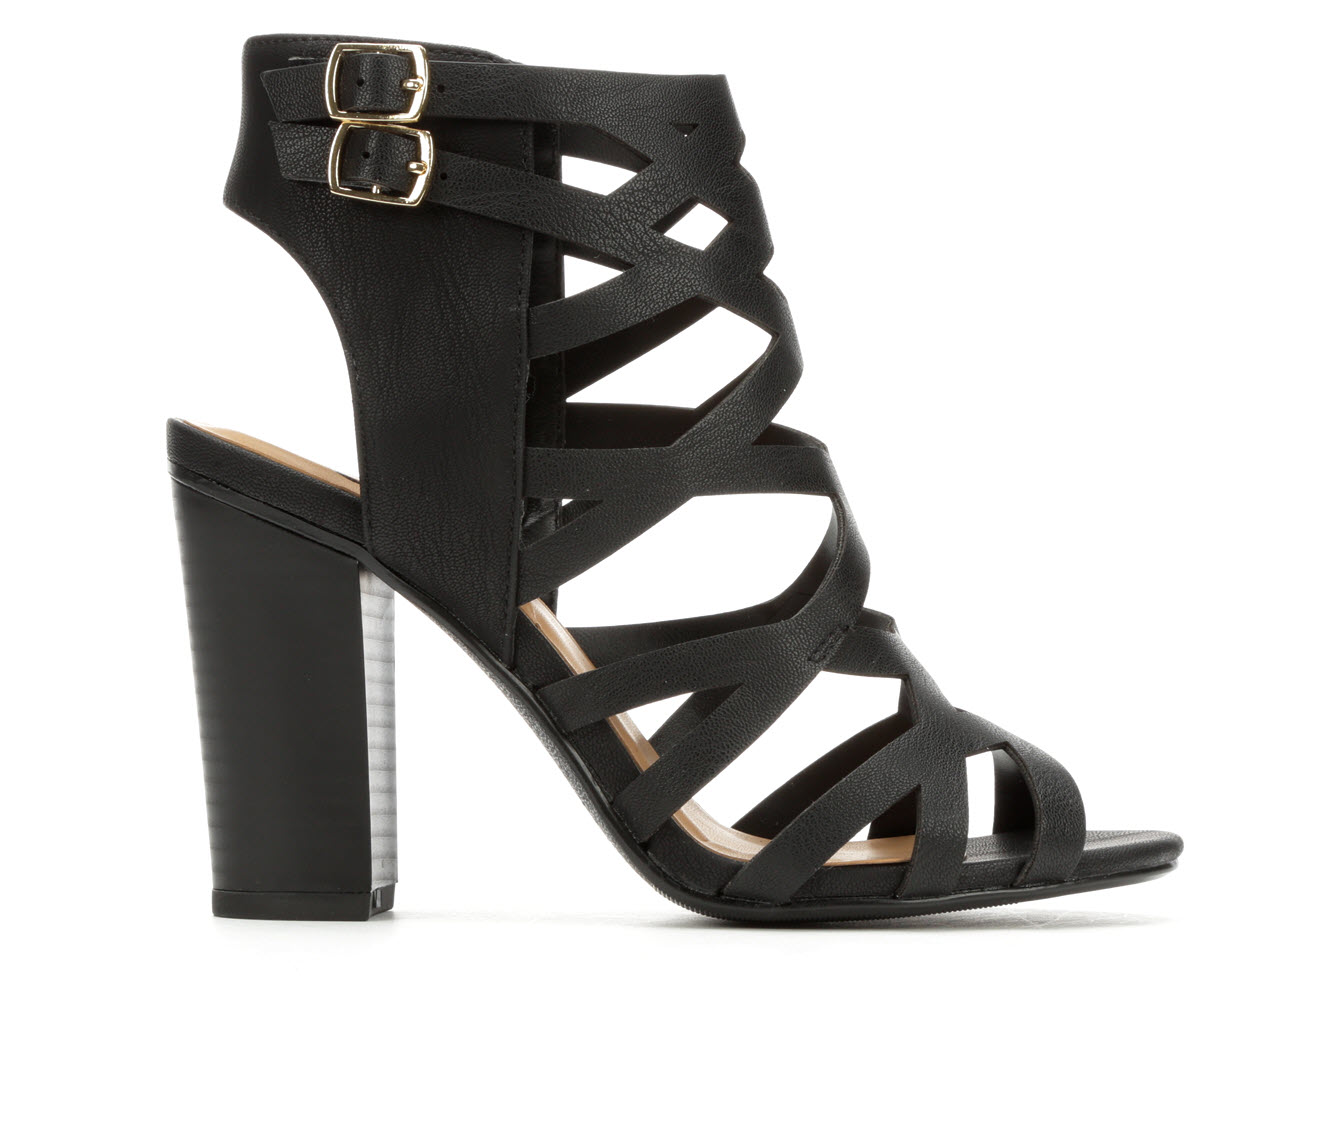 Delicious Country Women's Dress Shoe (Black Faux Leather)